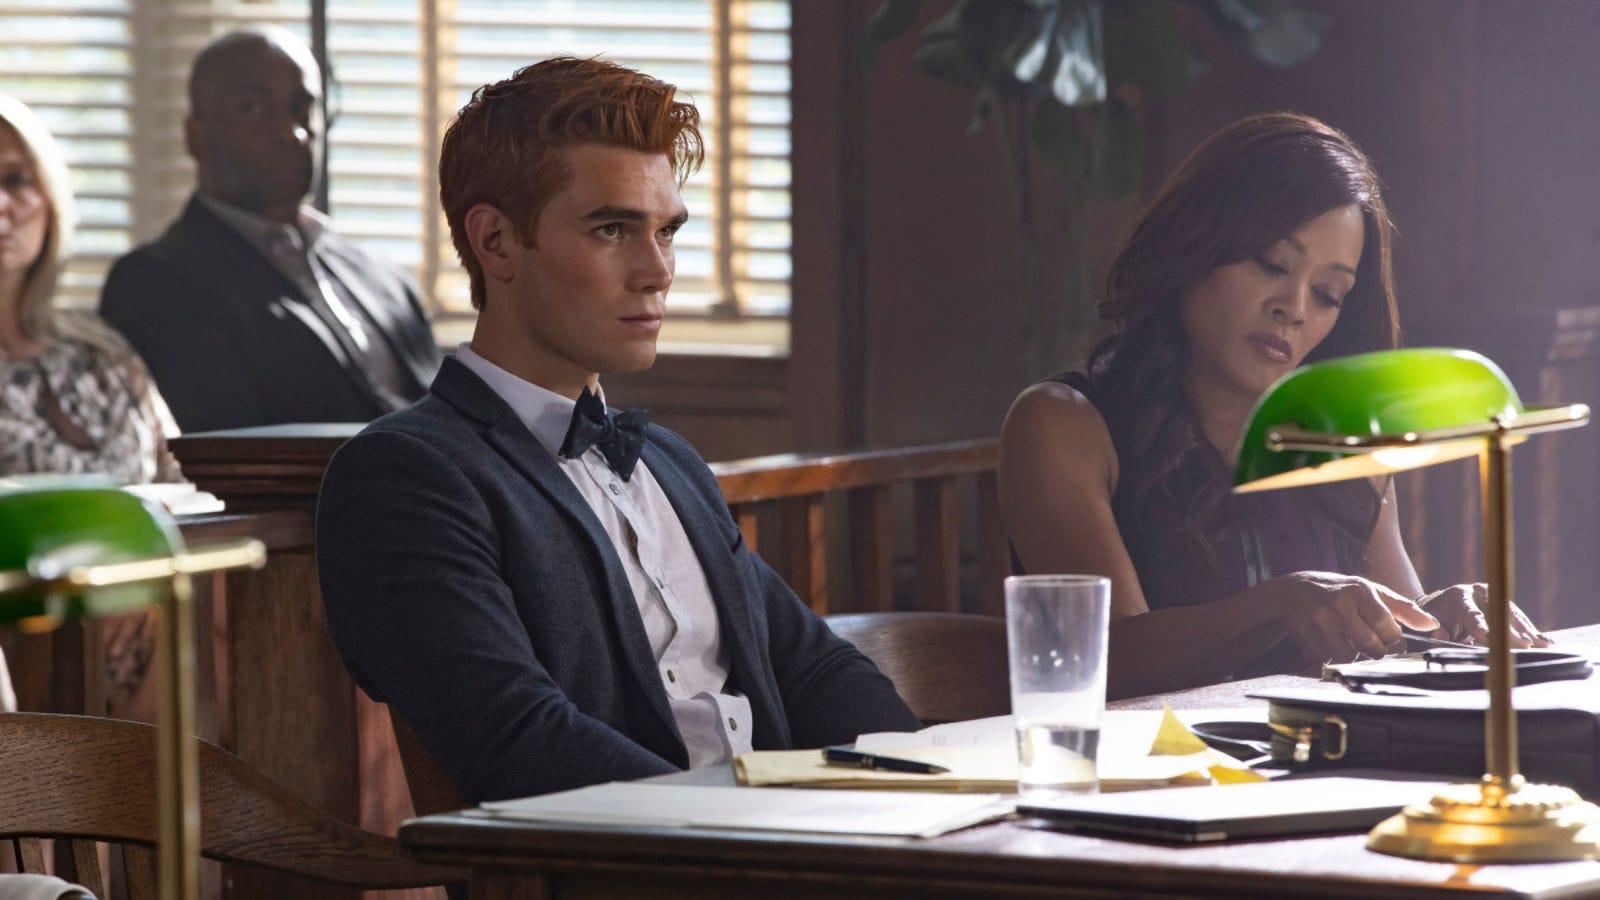 The season 3 premiere of Riverdale was pretty boring, giving